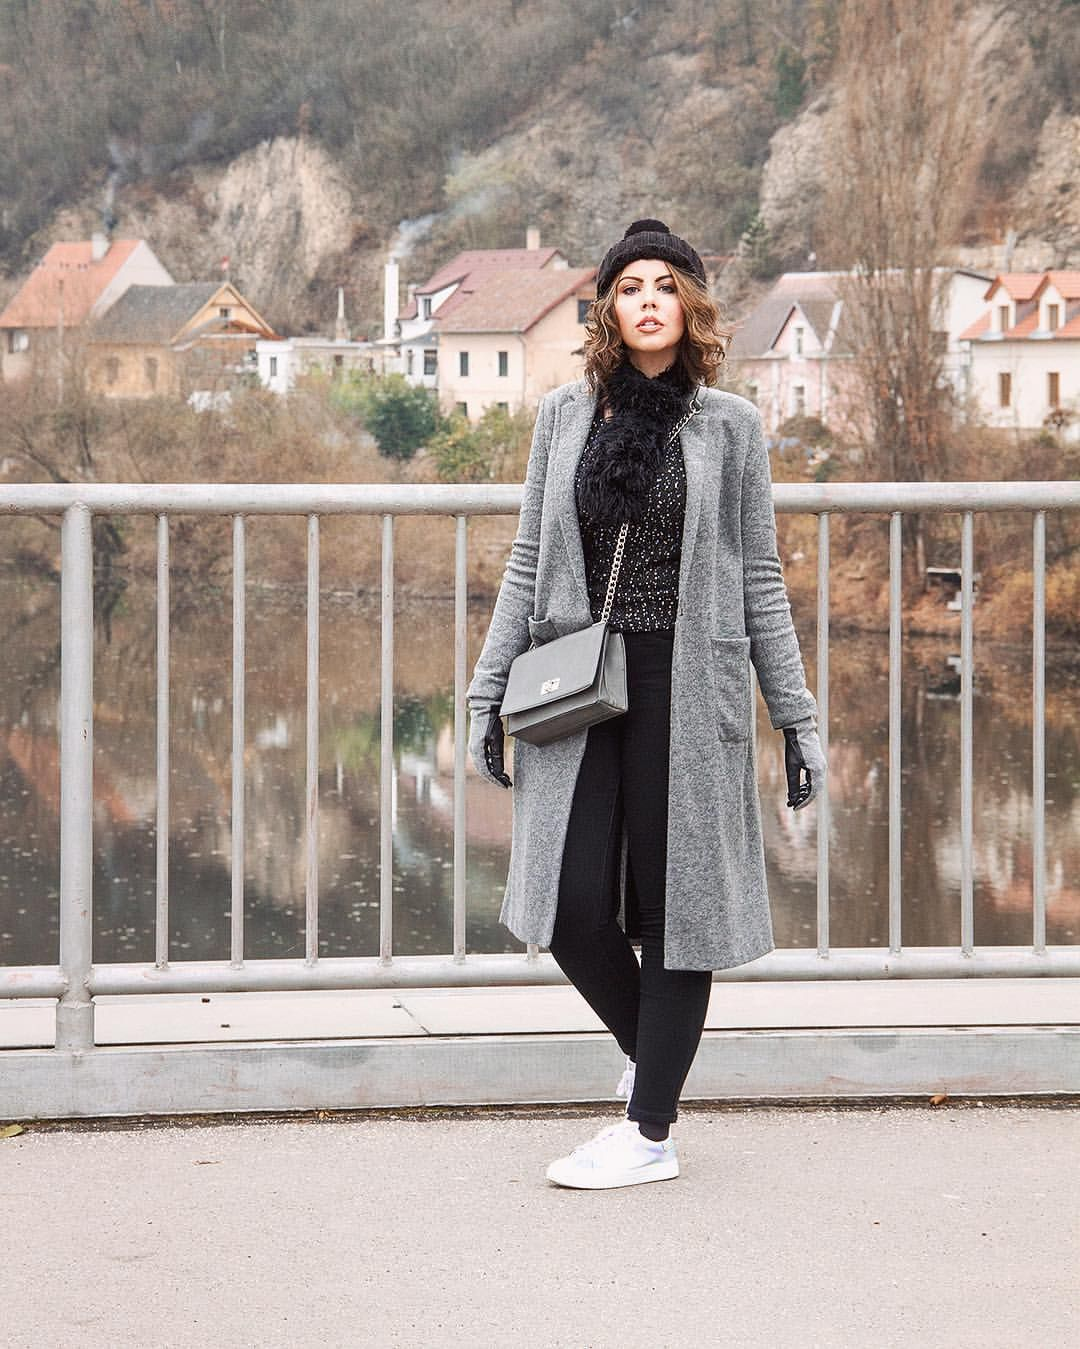 ed6c0e0d74 Look de inverno com casaco cinza sobretudo